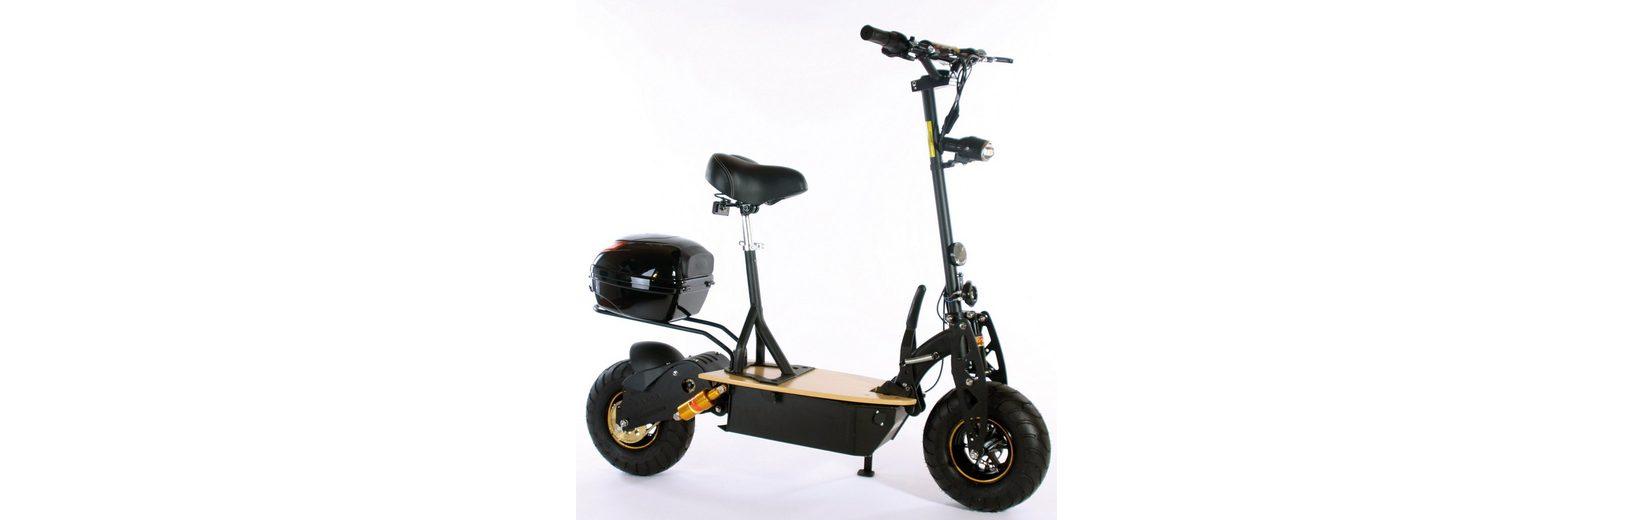 Didi Thurau Edition Elektro-Roller Eco-City-Liner, 20 km/h, »Safety Plus«